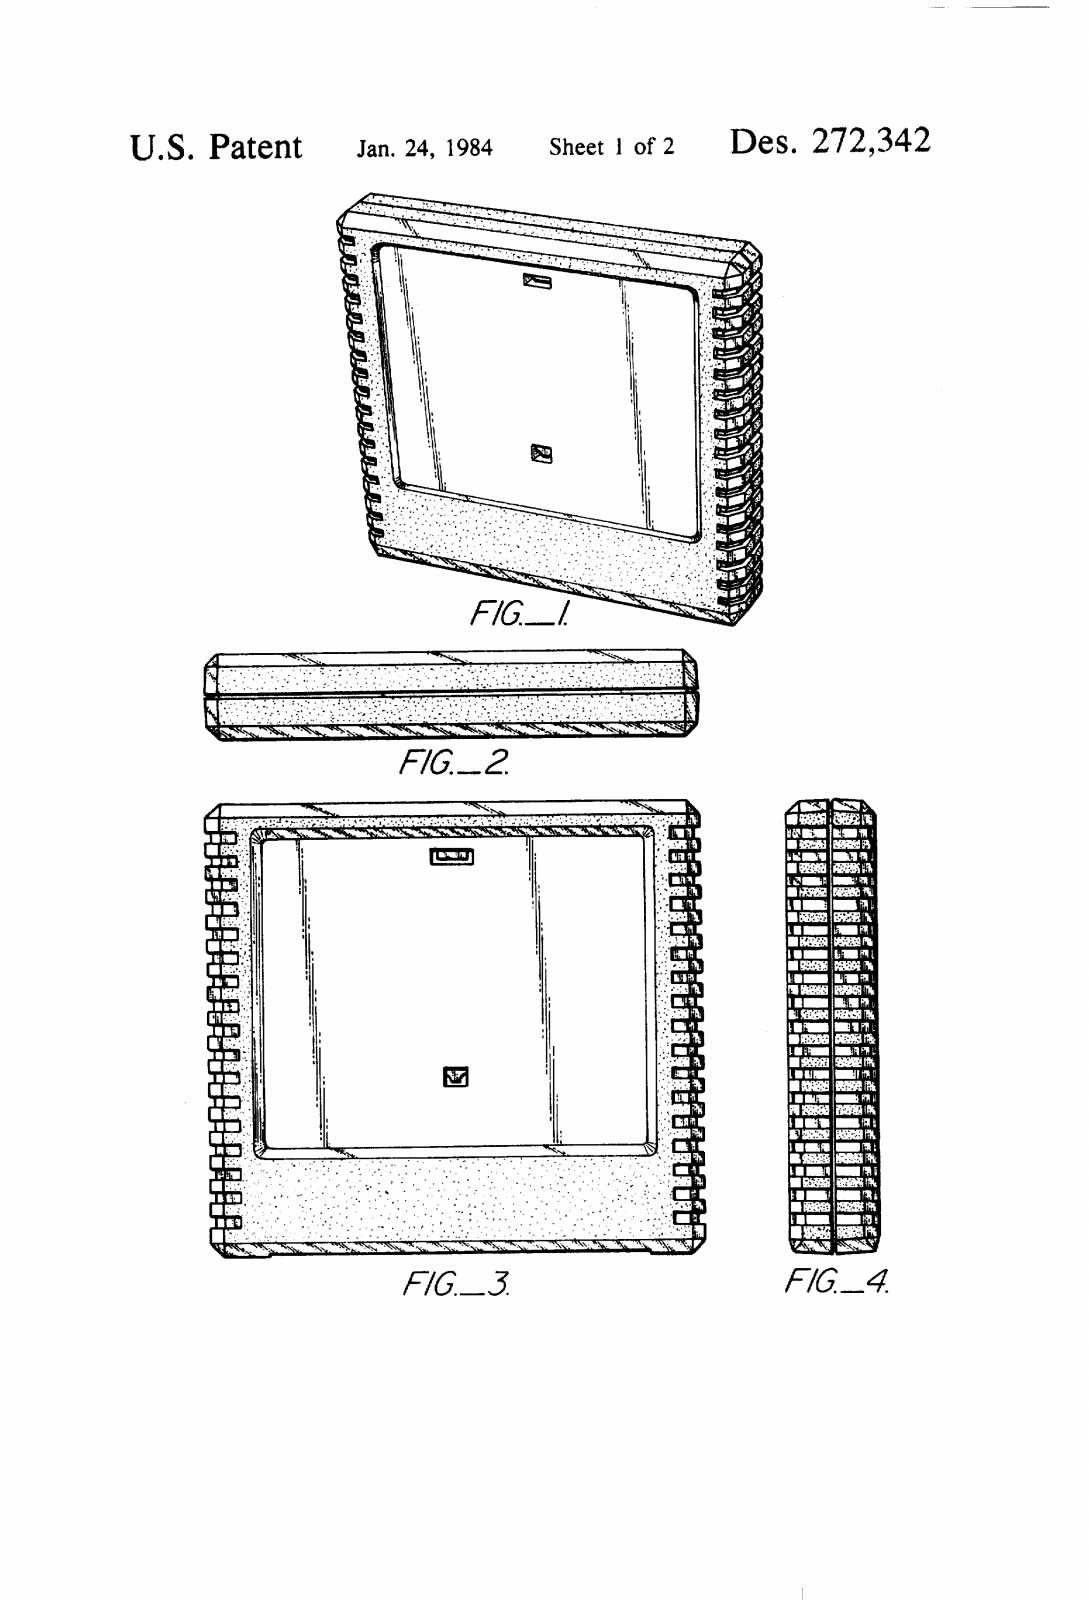 Atari Console Game Cart And Controller Patent